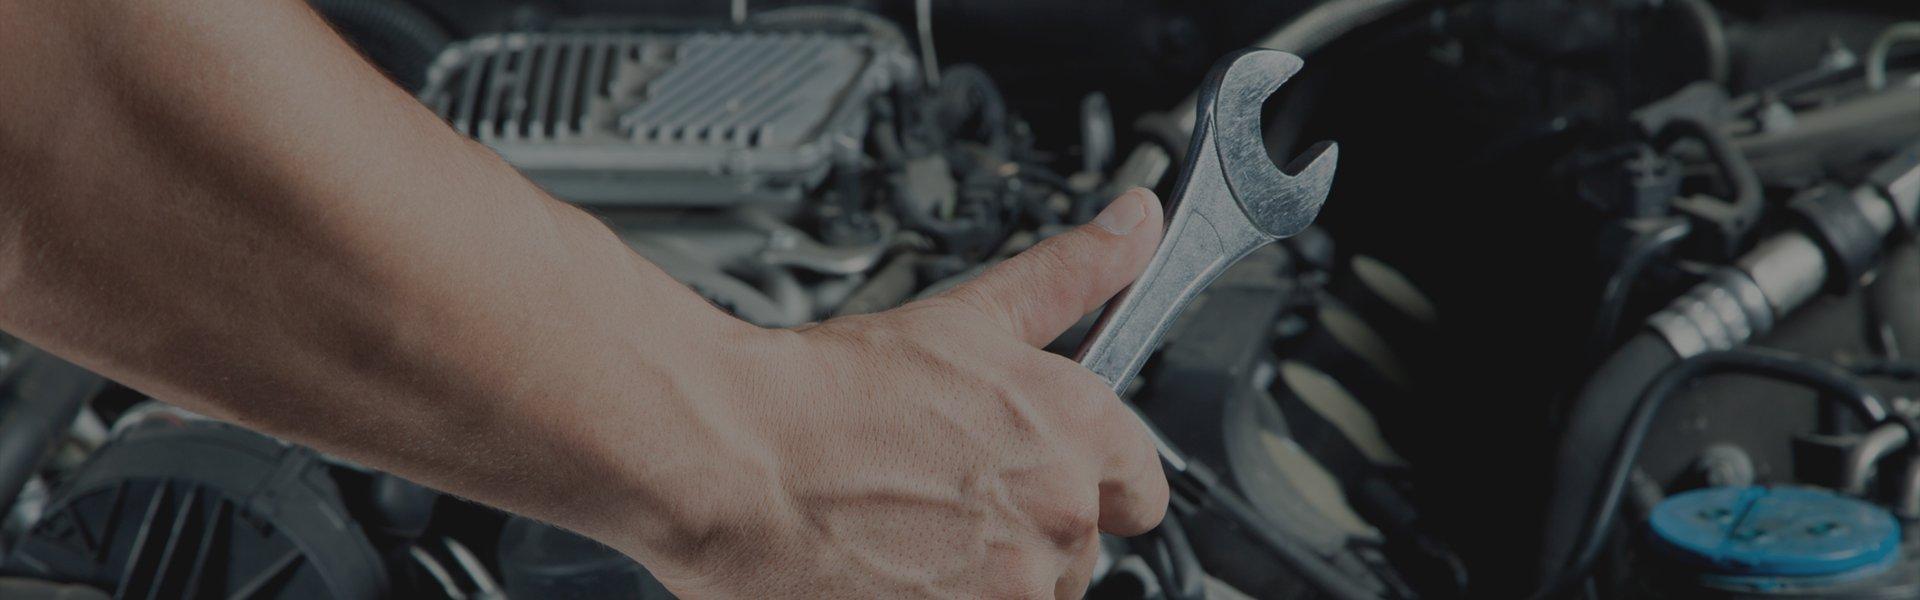 service mavromatis auto